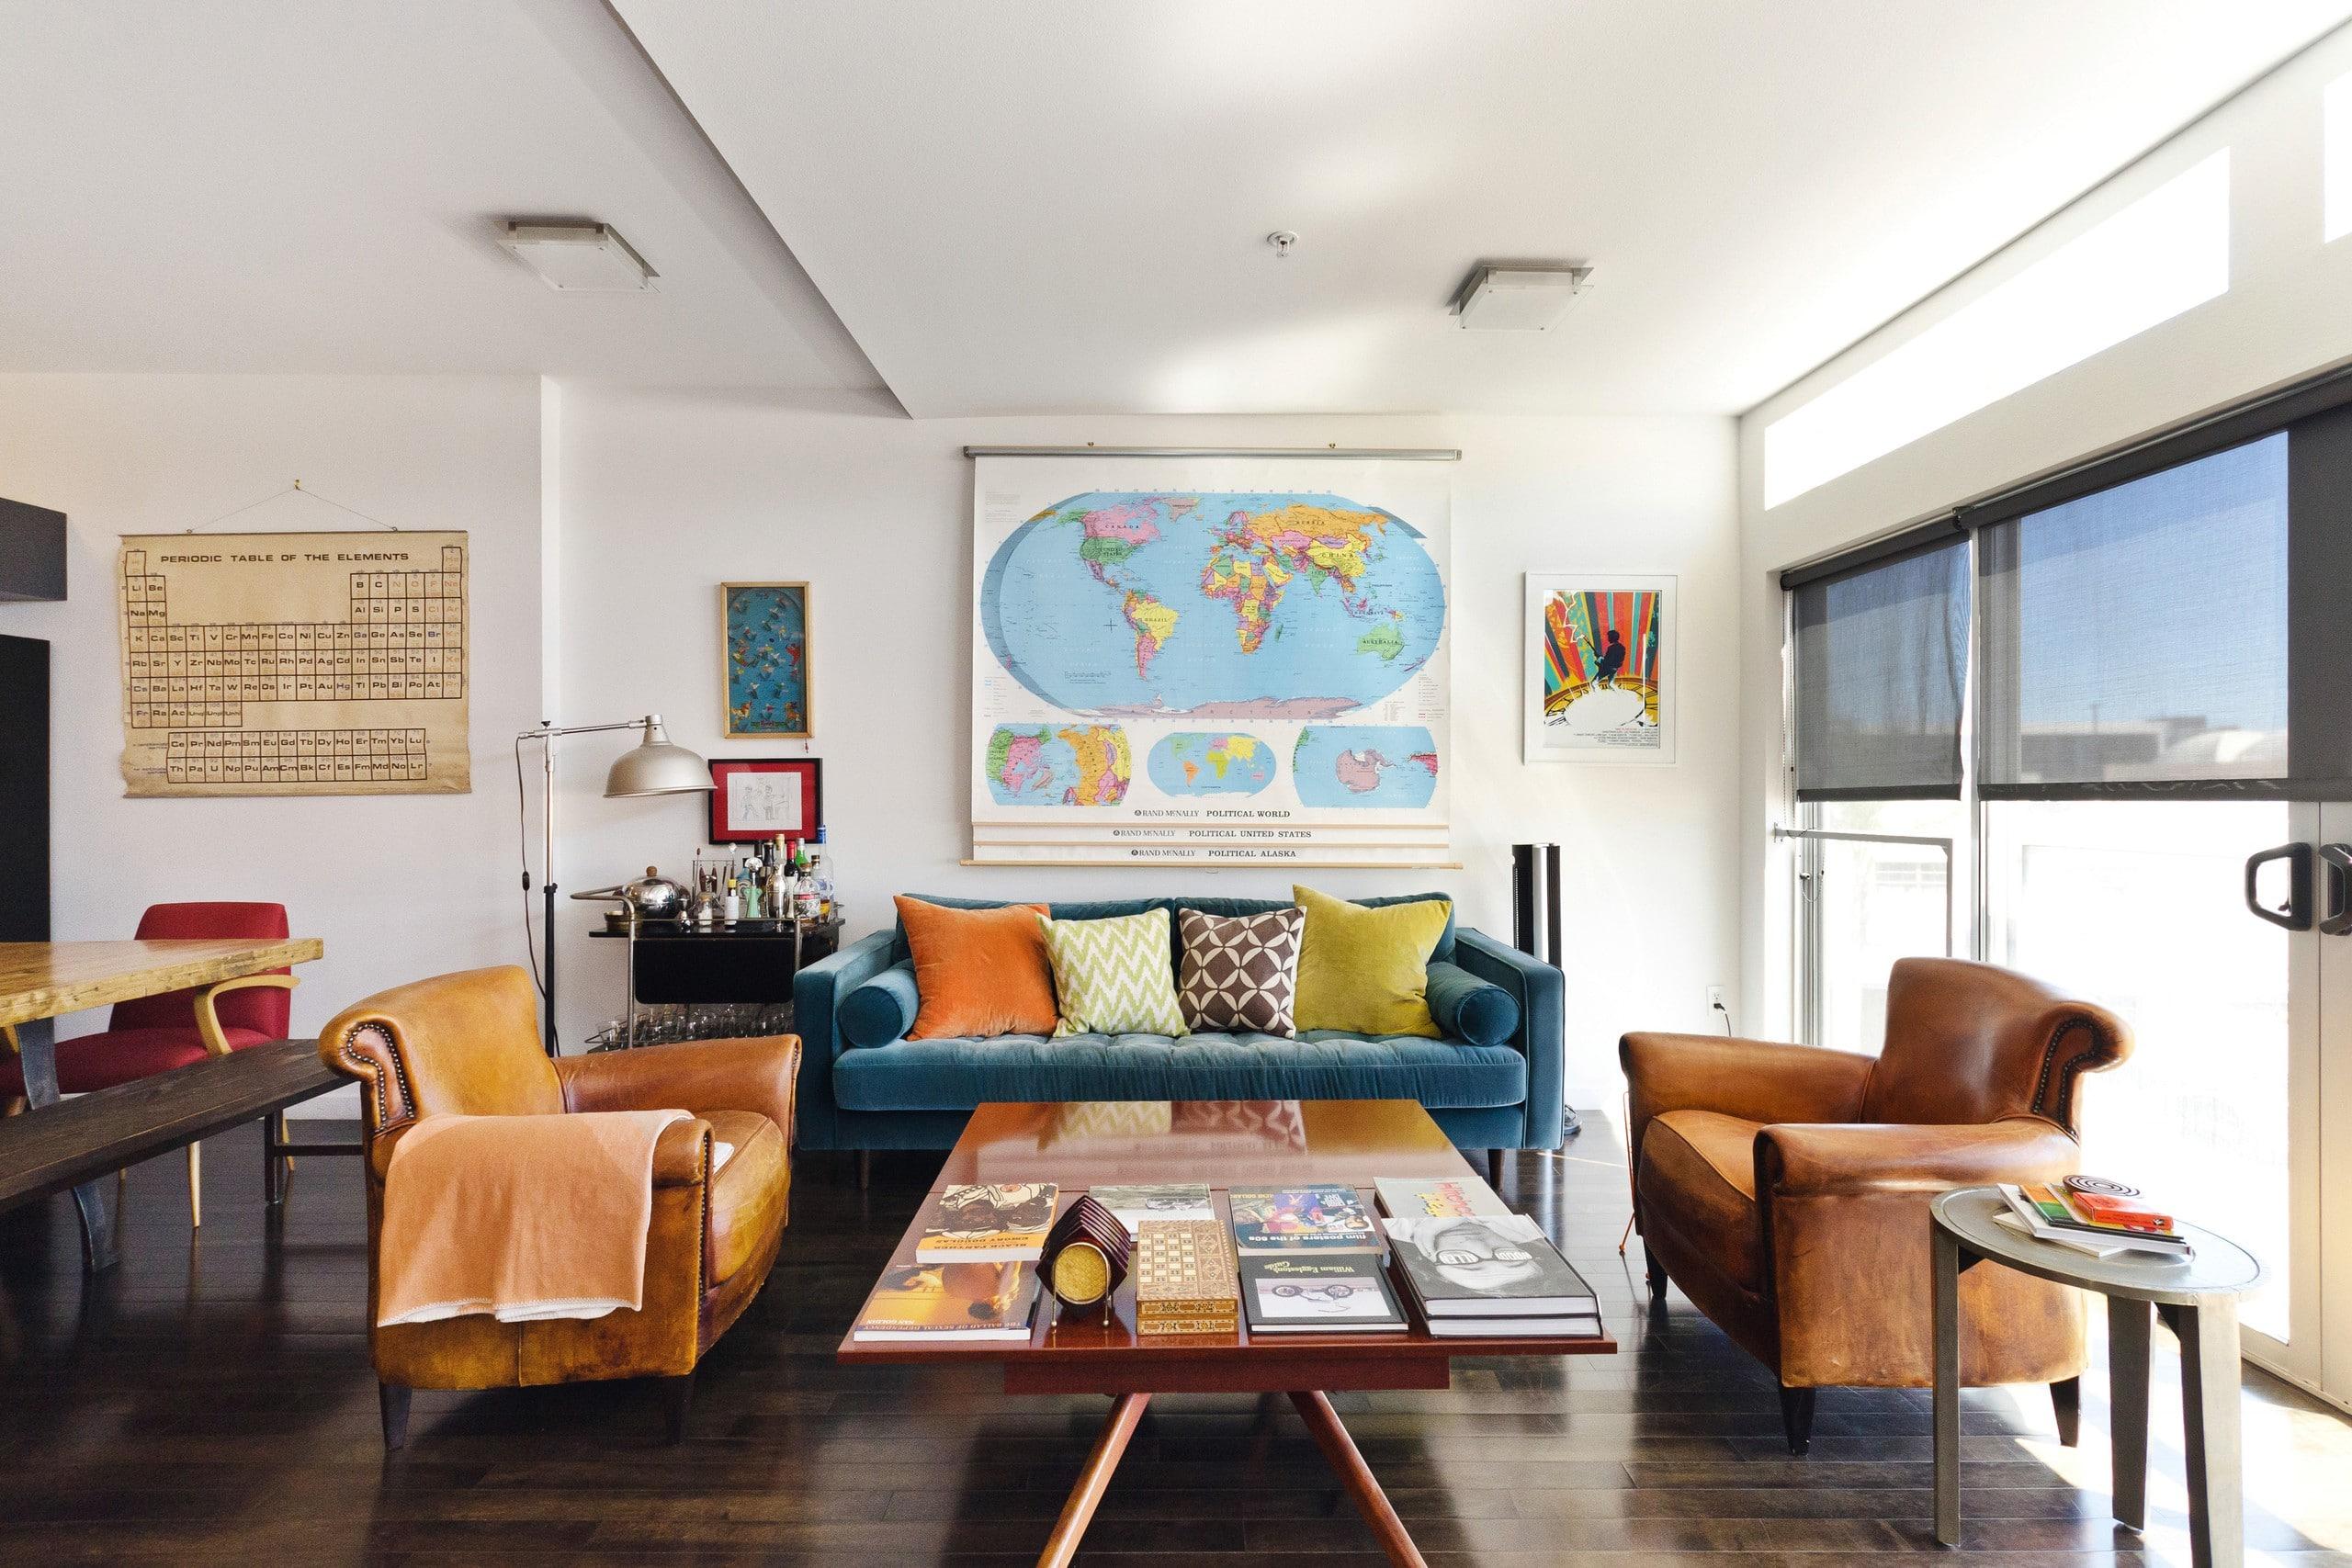 top 100 airbnb rentals 2017 in marina del rey california